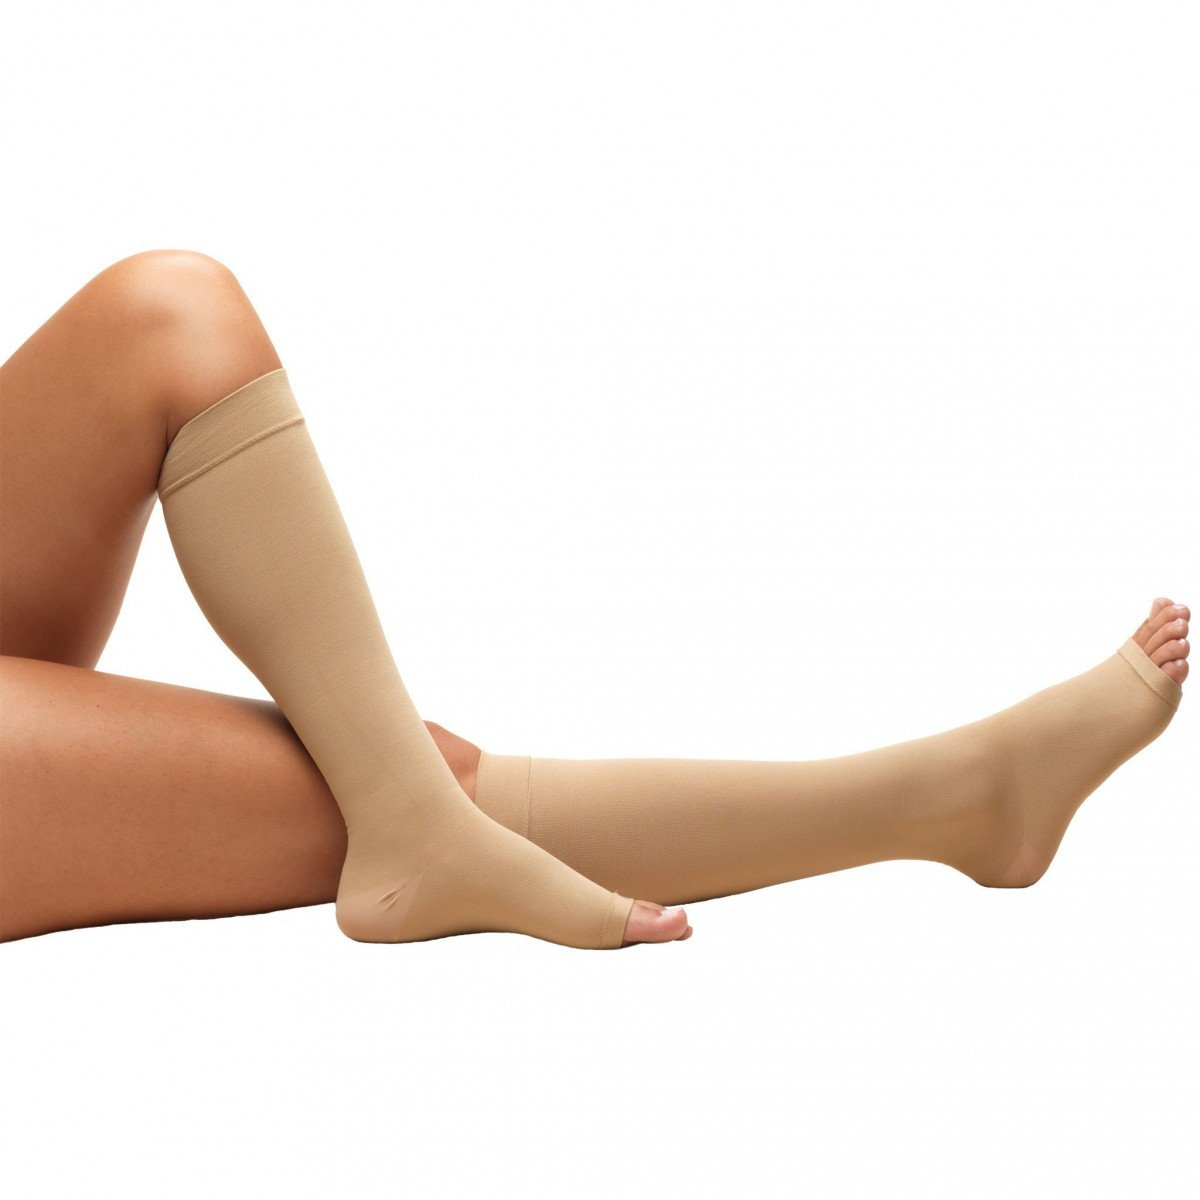 64787fdd6b3 Truform Anti-embolism Stockings 18 mmHg Knee High Open Toe